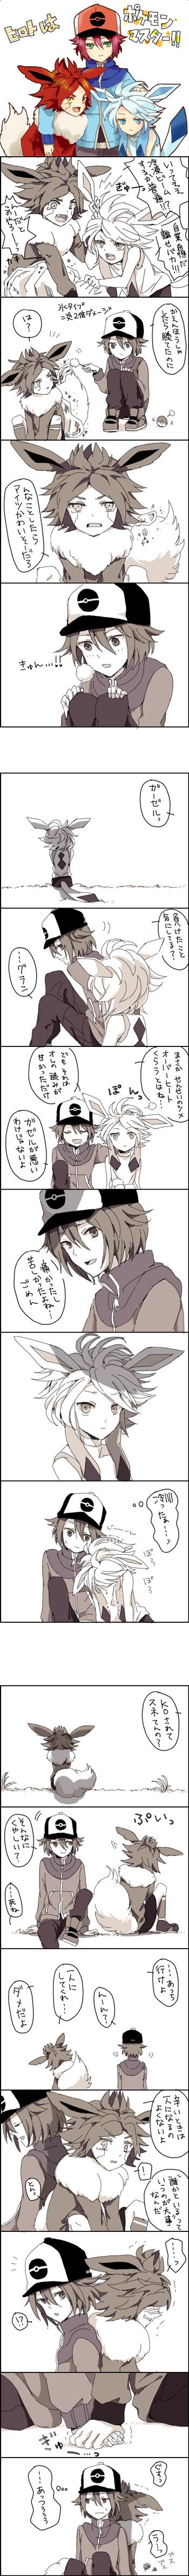 Tags: Anime, Masui, Pokémon, Inazuma Eleven, Suzuno Fuusuke, Nagumo Haruya, Kiyama Hiroto, Glaceon (Cosplay), Touya (Pokémon) (Cosplay), Flareon (Cosplay), Pixiv, Comic, 3top